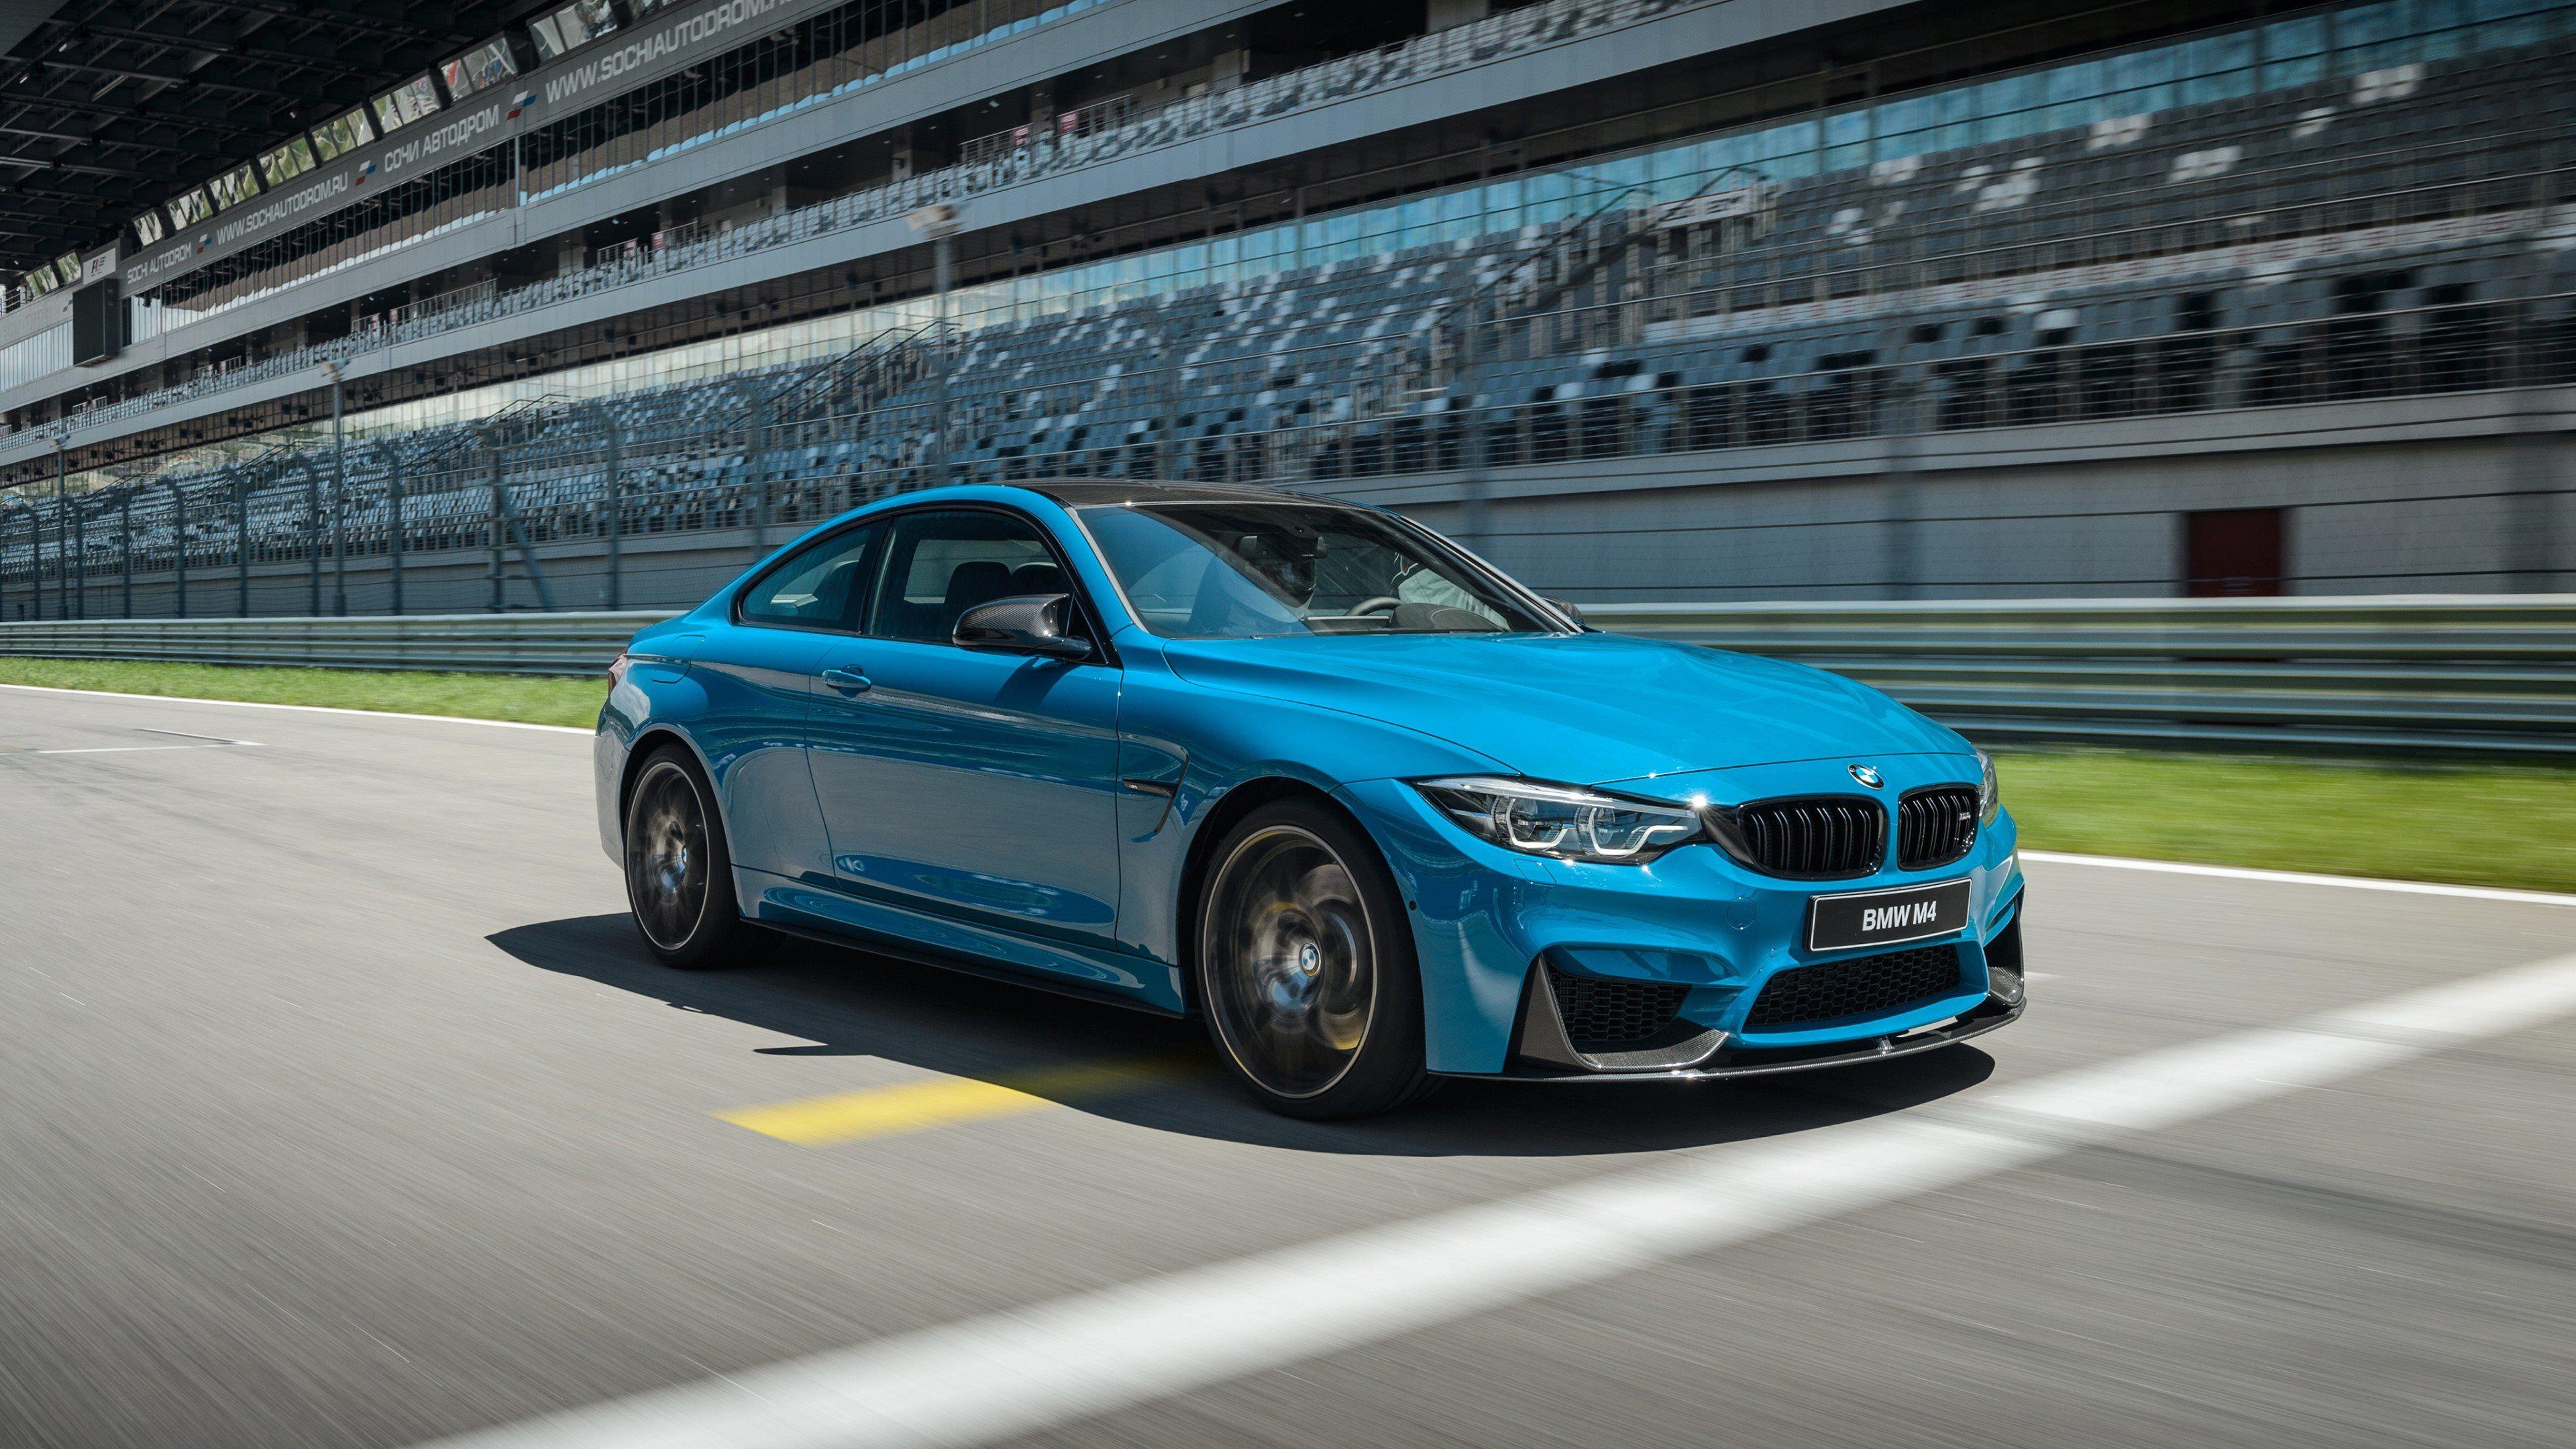 4k 2017 Bmw M4 Competition Package 2017 Cars Raceway Blue M4